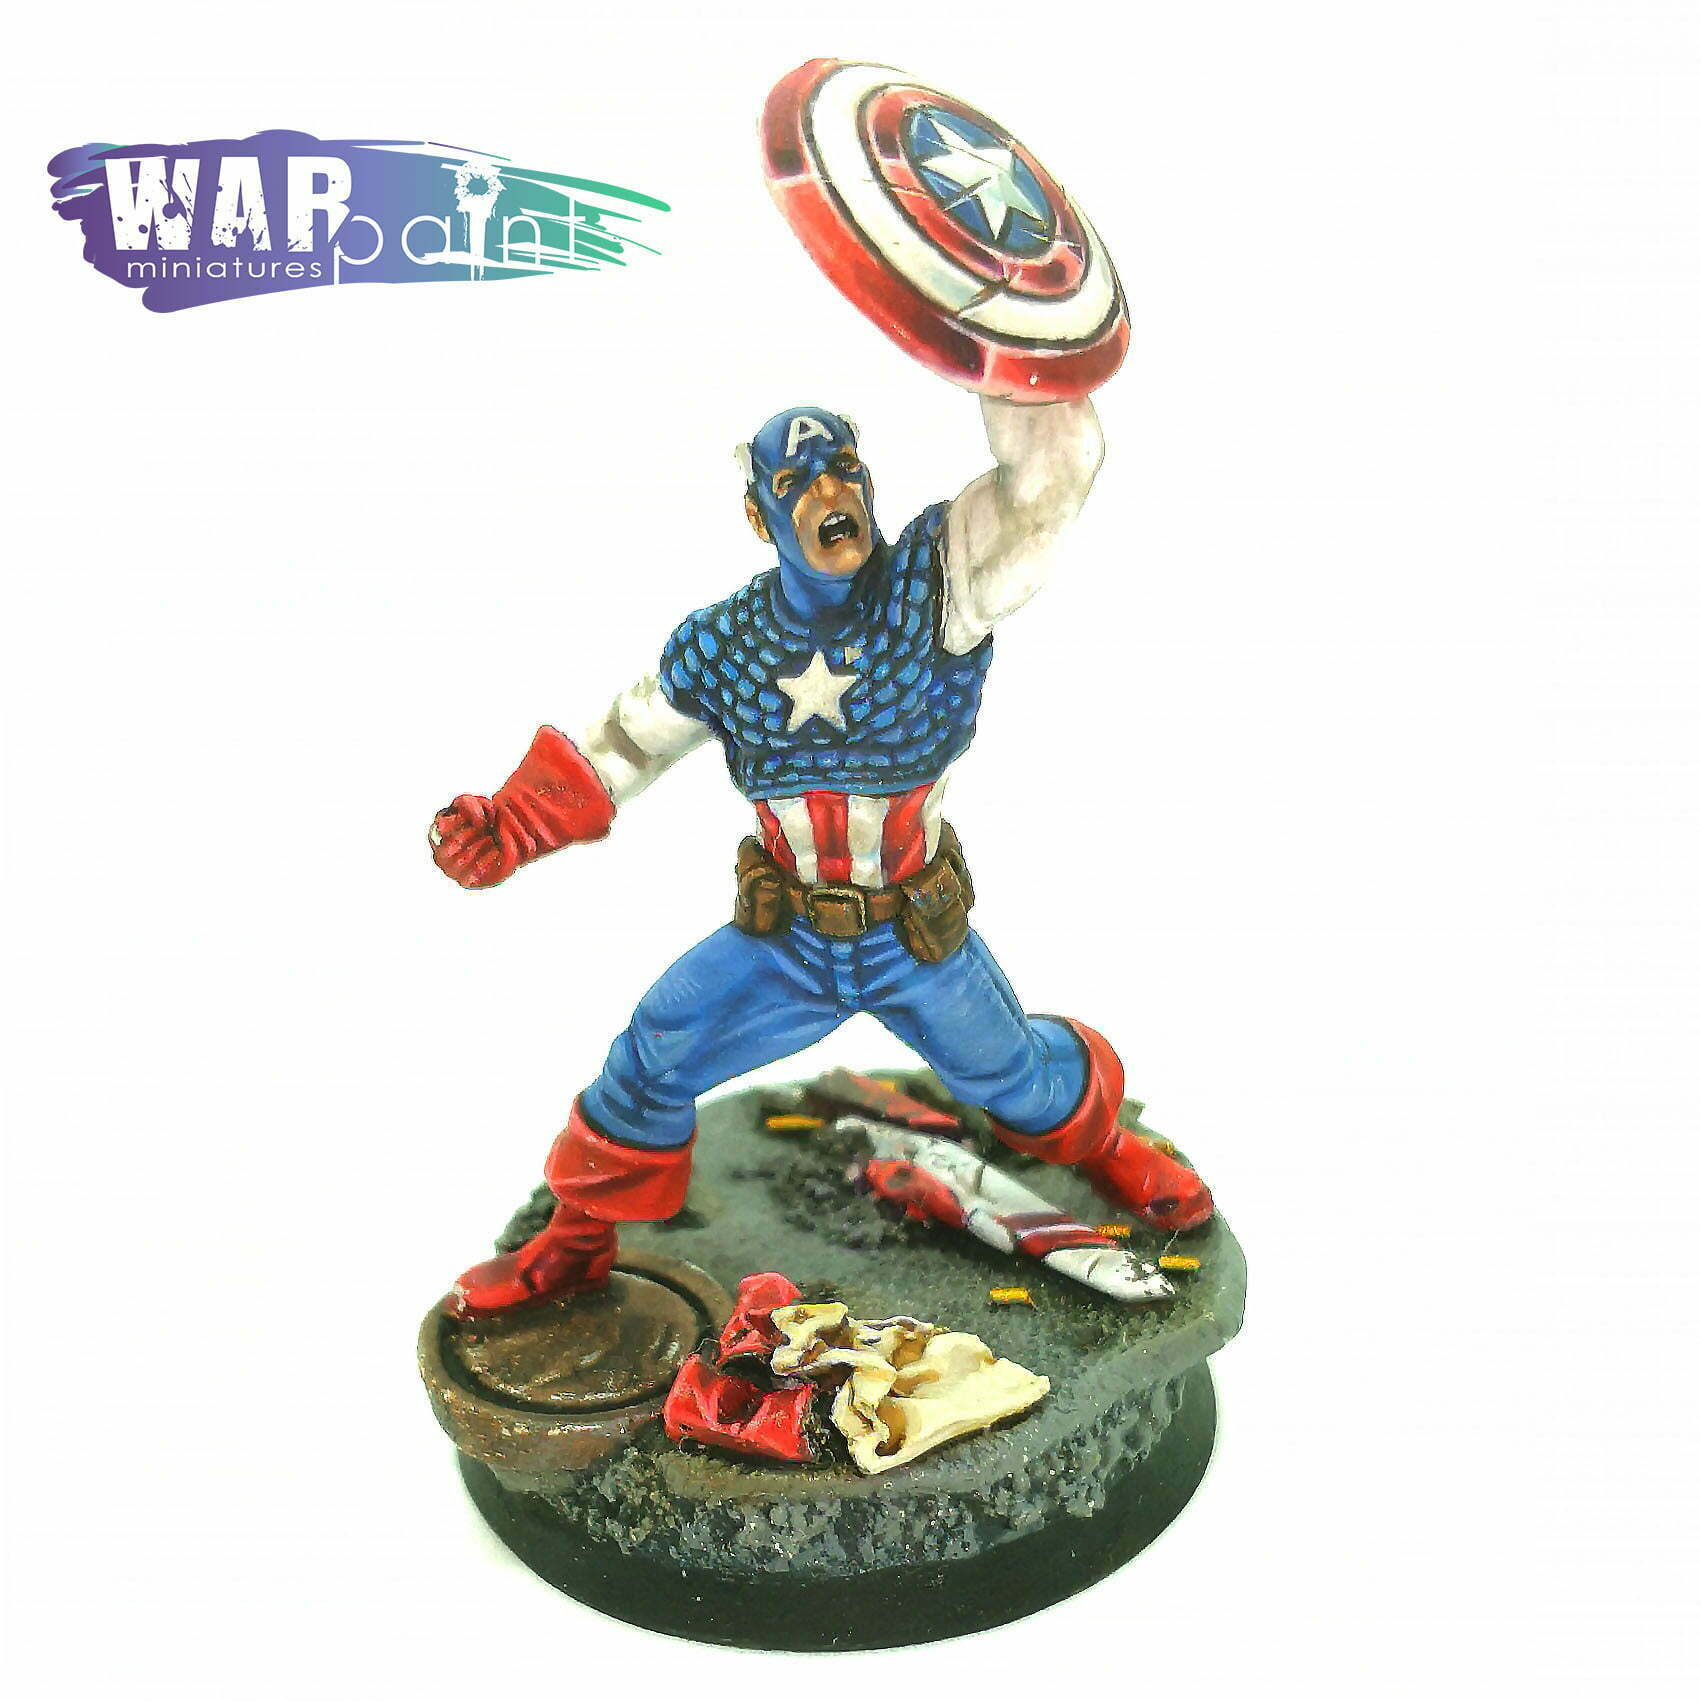 Captain-America-Knight-Models-2